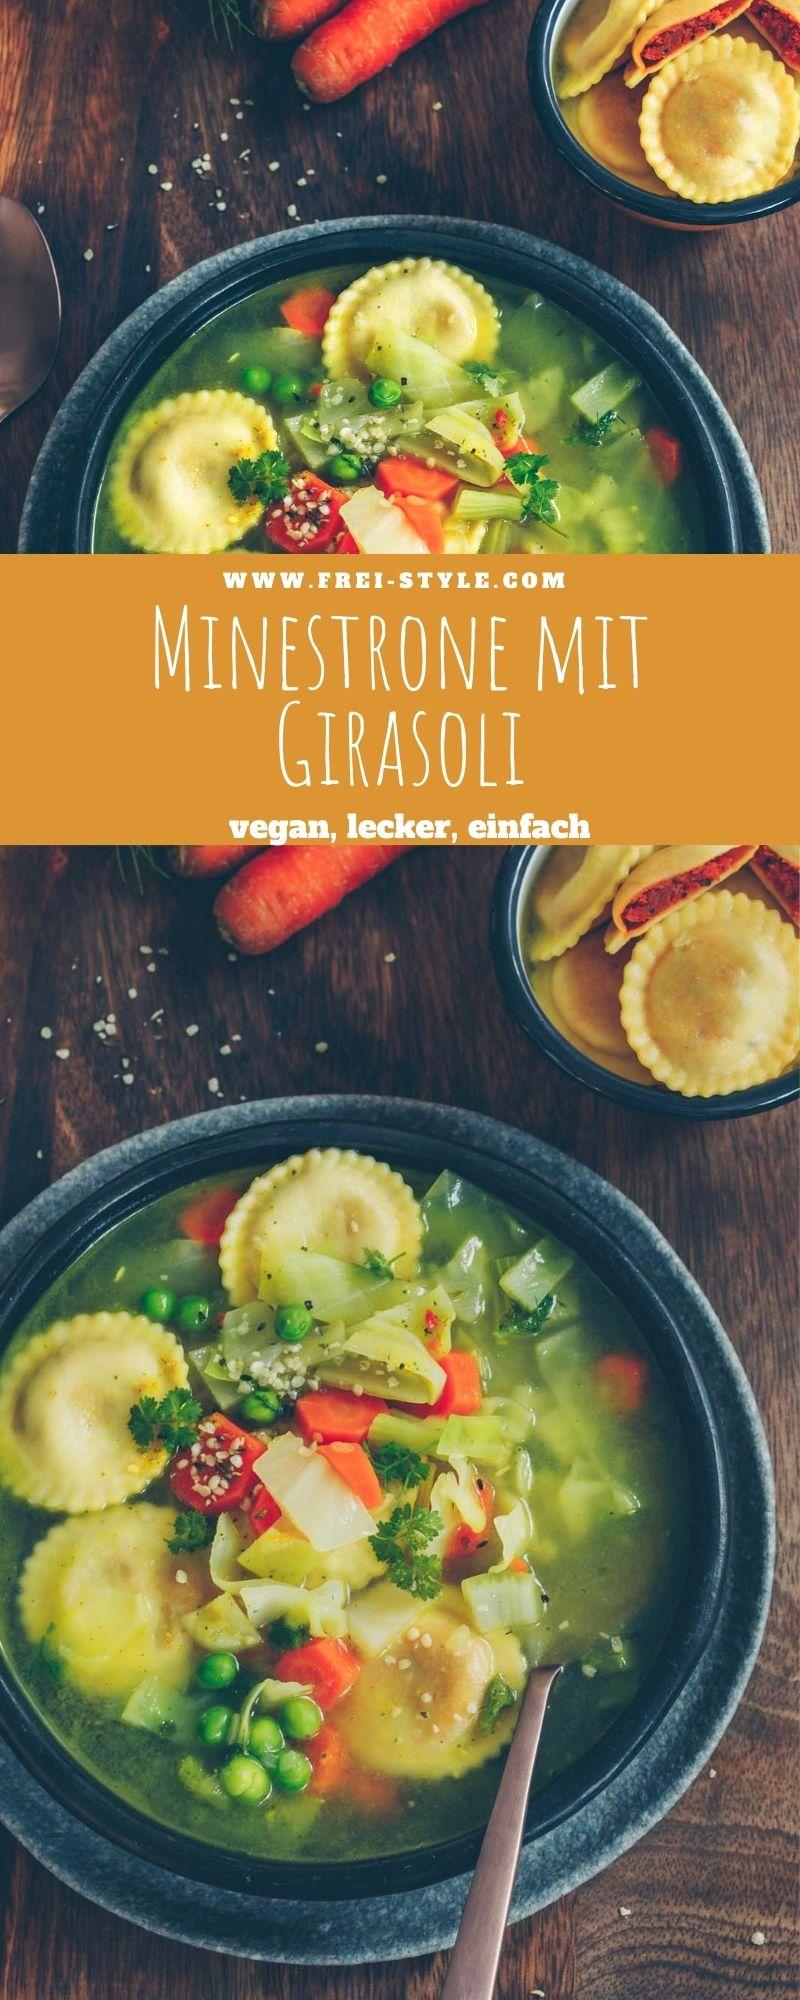 Minestrone mit Girasoli